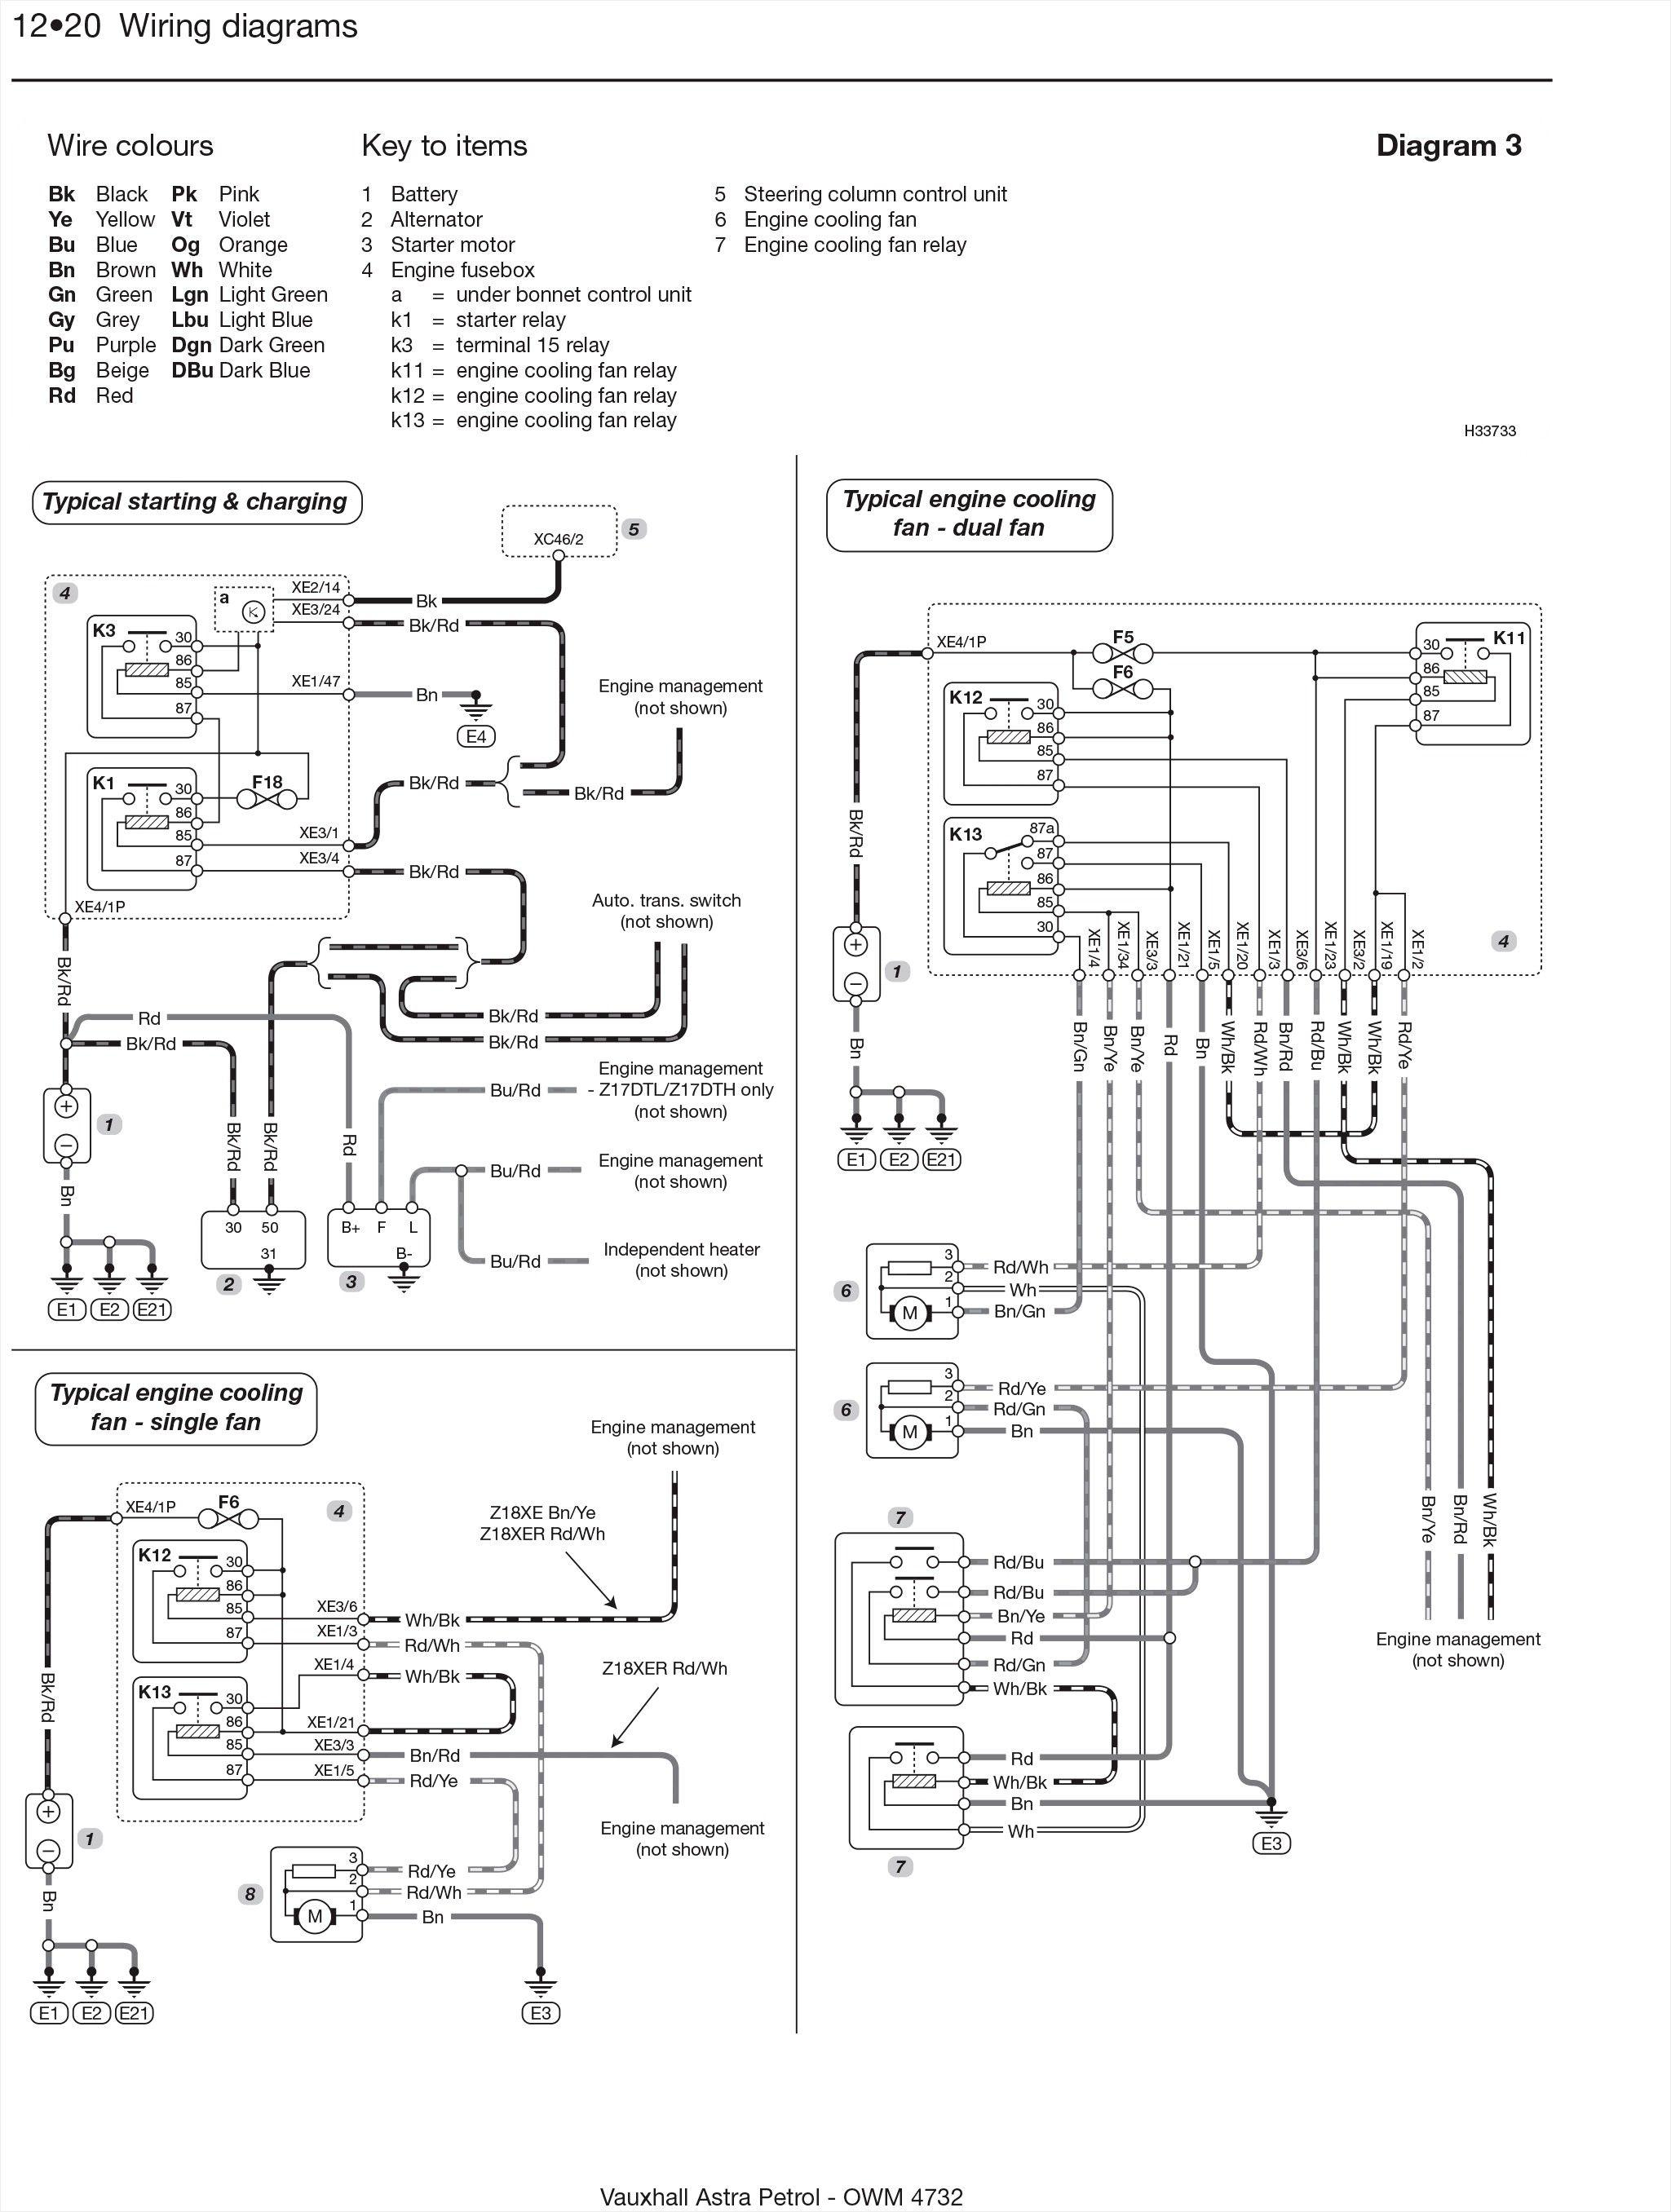 Best Of Vauxhall Alternator Wiring Diagram Diagrams Digramssample Diagramimages Wiringdiagramsample Wiringdiagram Check Mo Diagram Vauxhall Astra Vauxhall